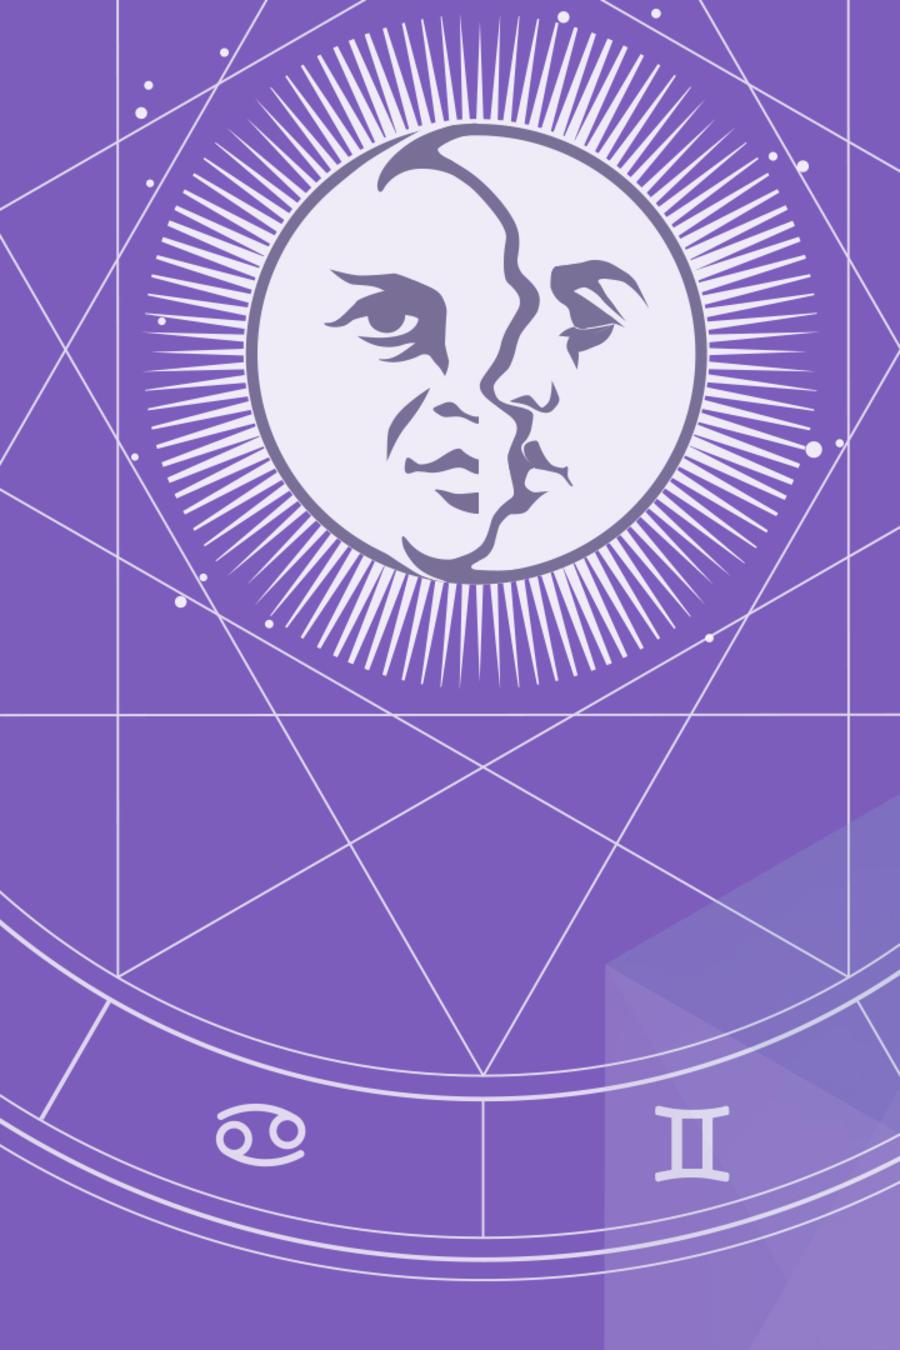 Horóscopo zodiacal del día miércoles